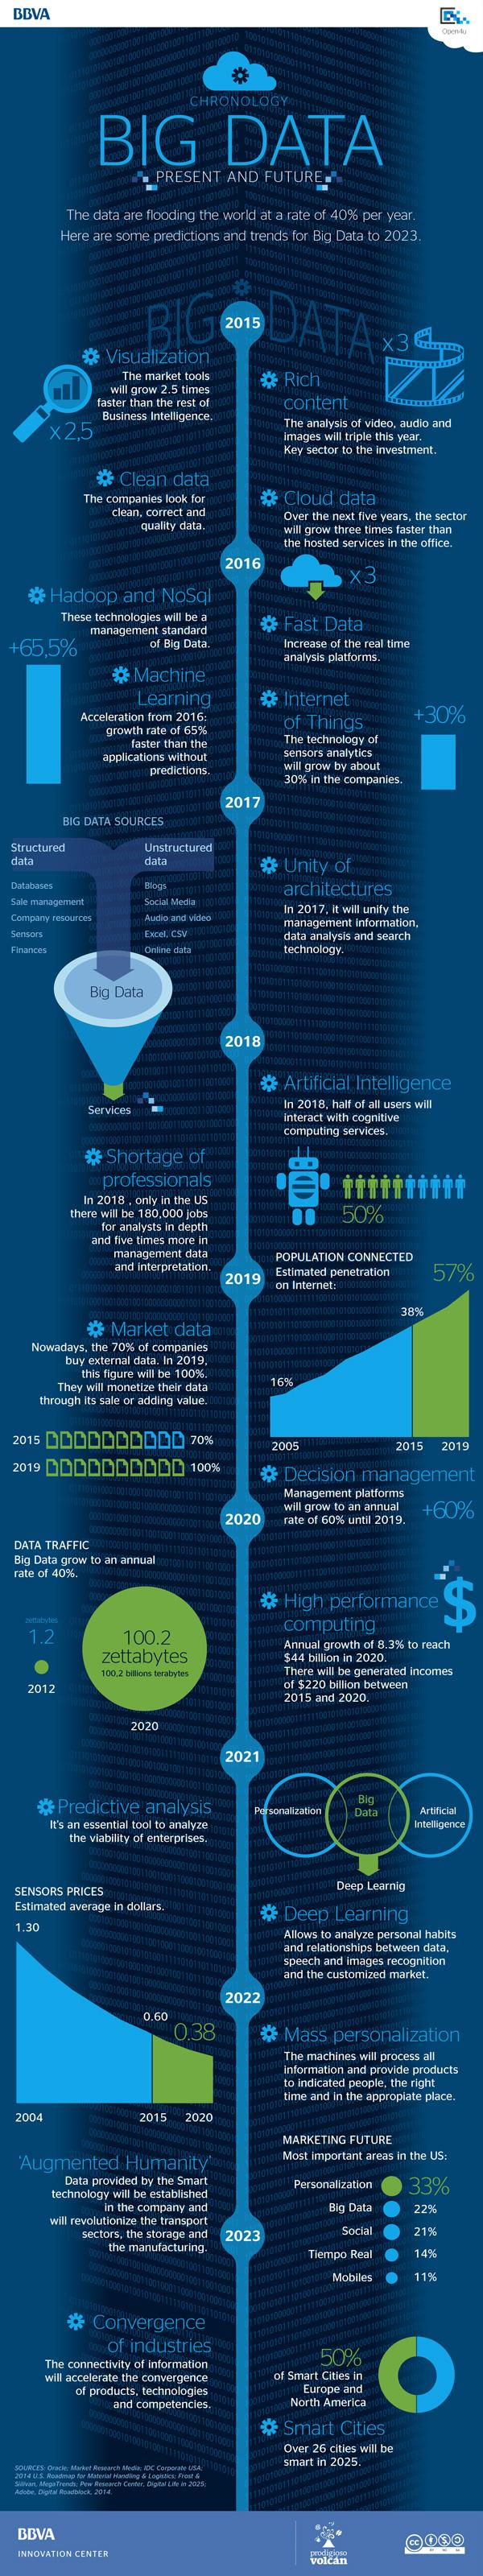 bbva-open4u-infographic-big-data-present-future